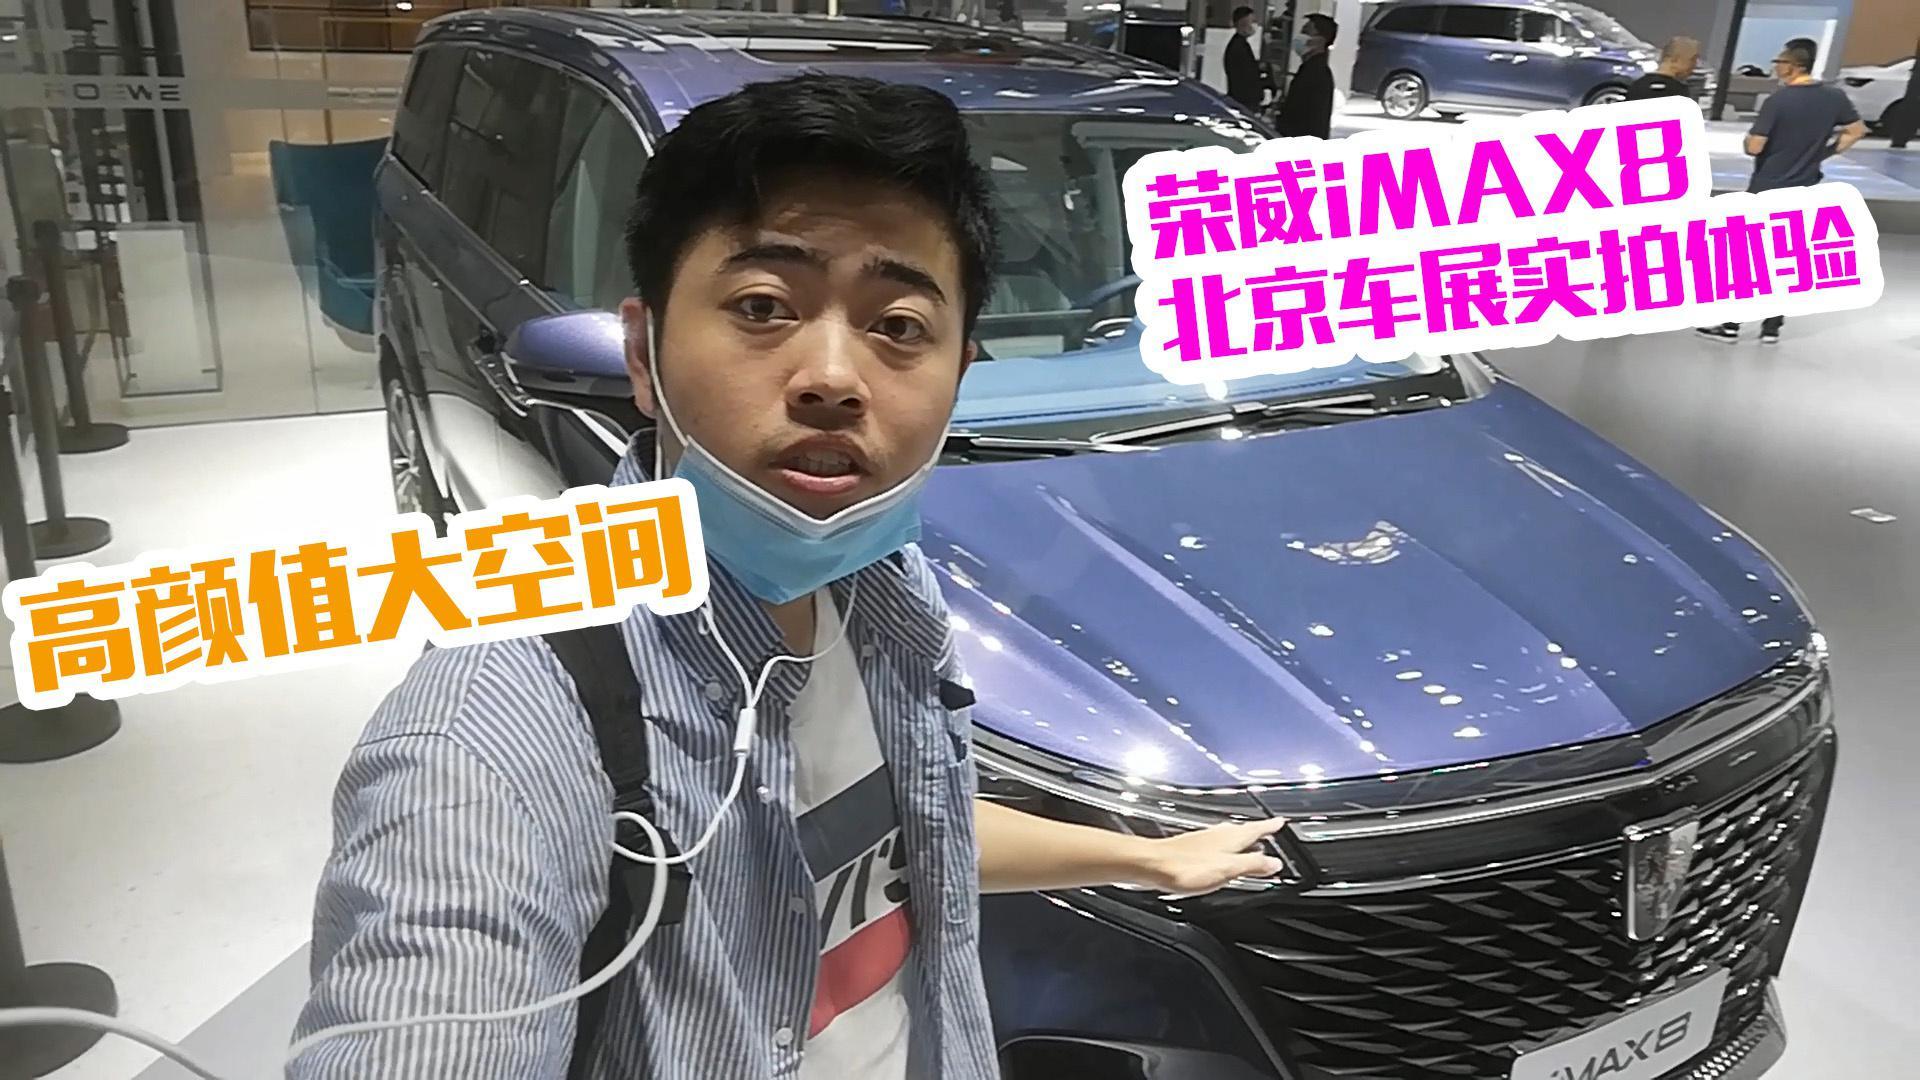 【GO车扫一扫】高颜值大空间 荣威iMAX8北京车展实拍体验